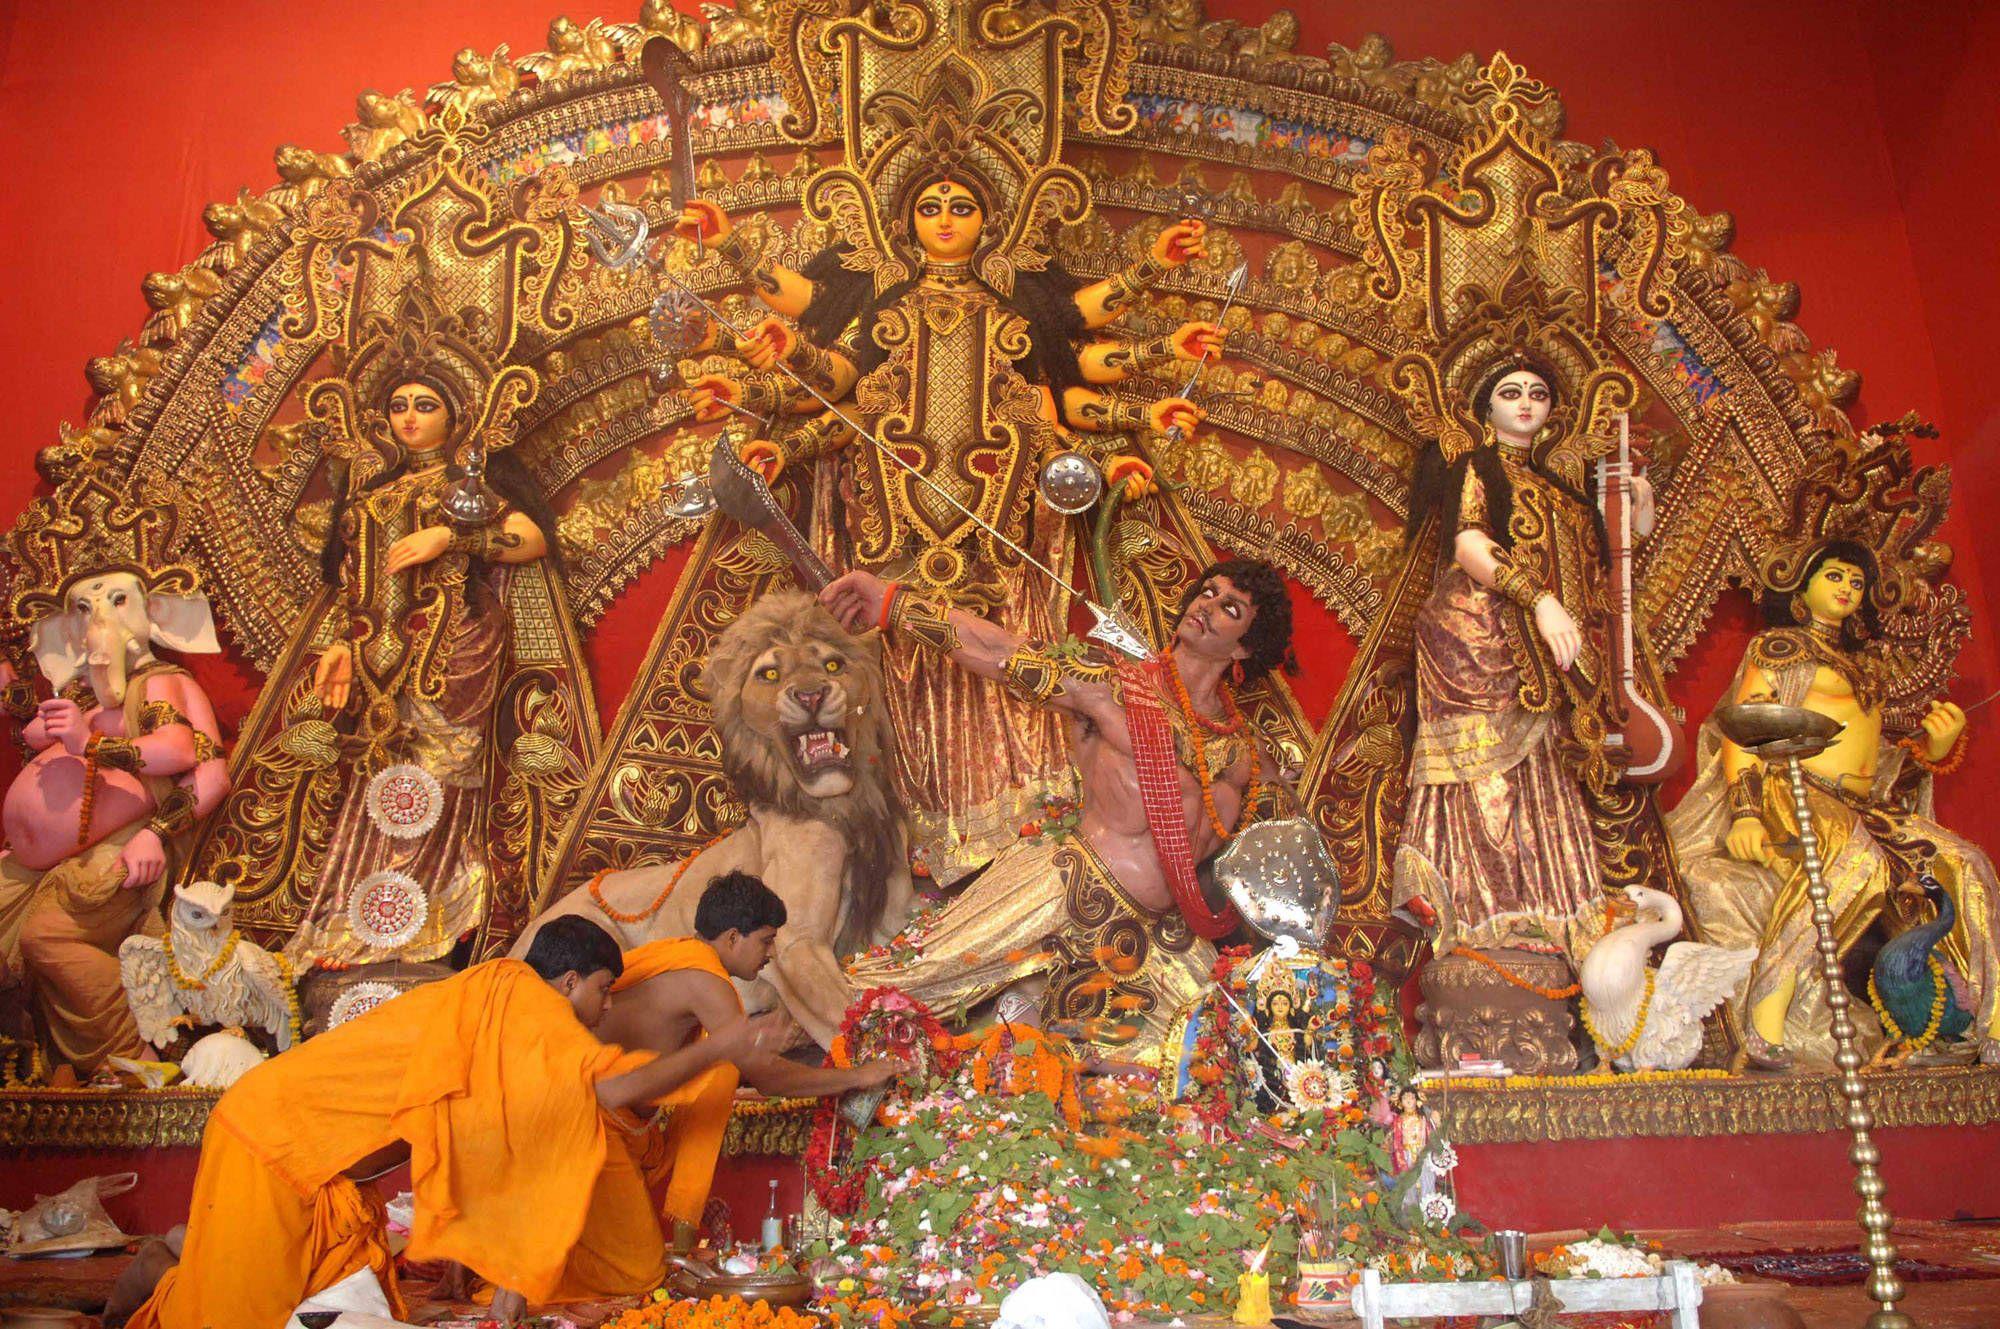 collection durga puja pictures happy easter day durga pooja vijaya dasami slokas calcutta bangalore live models durga pooja vijaya dasami slokas calcutta bangalore live models